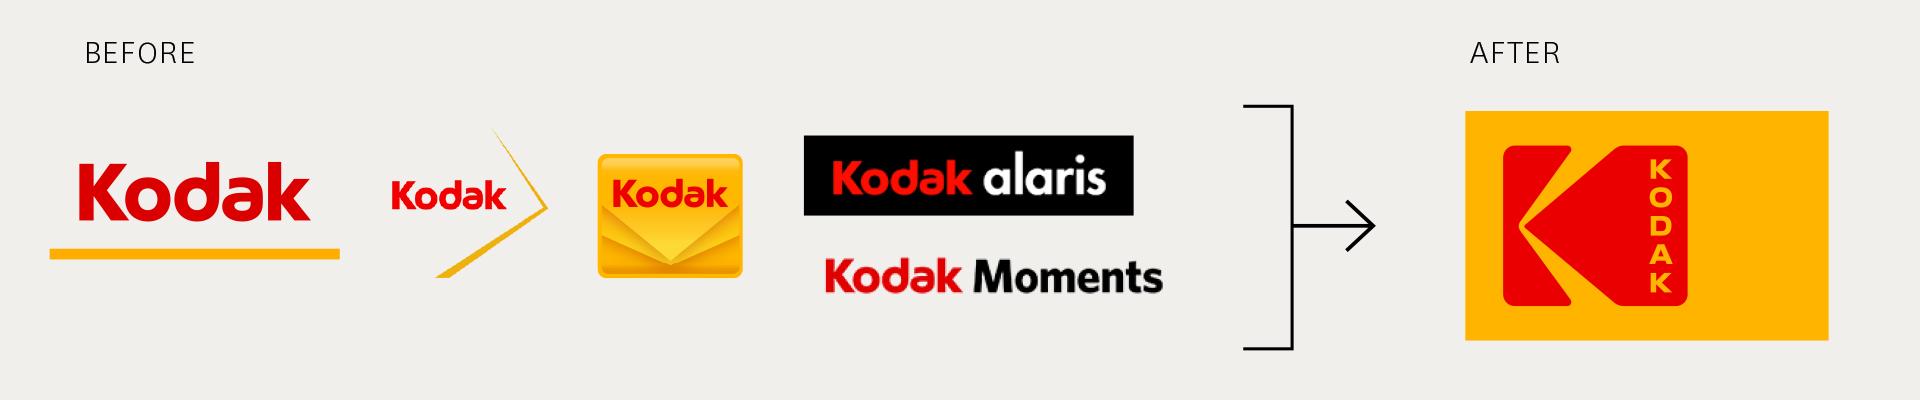 Kodak logo before after